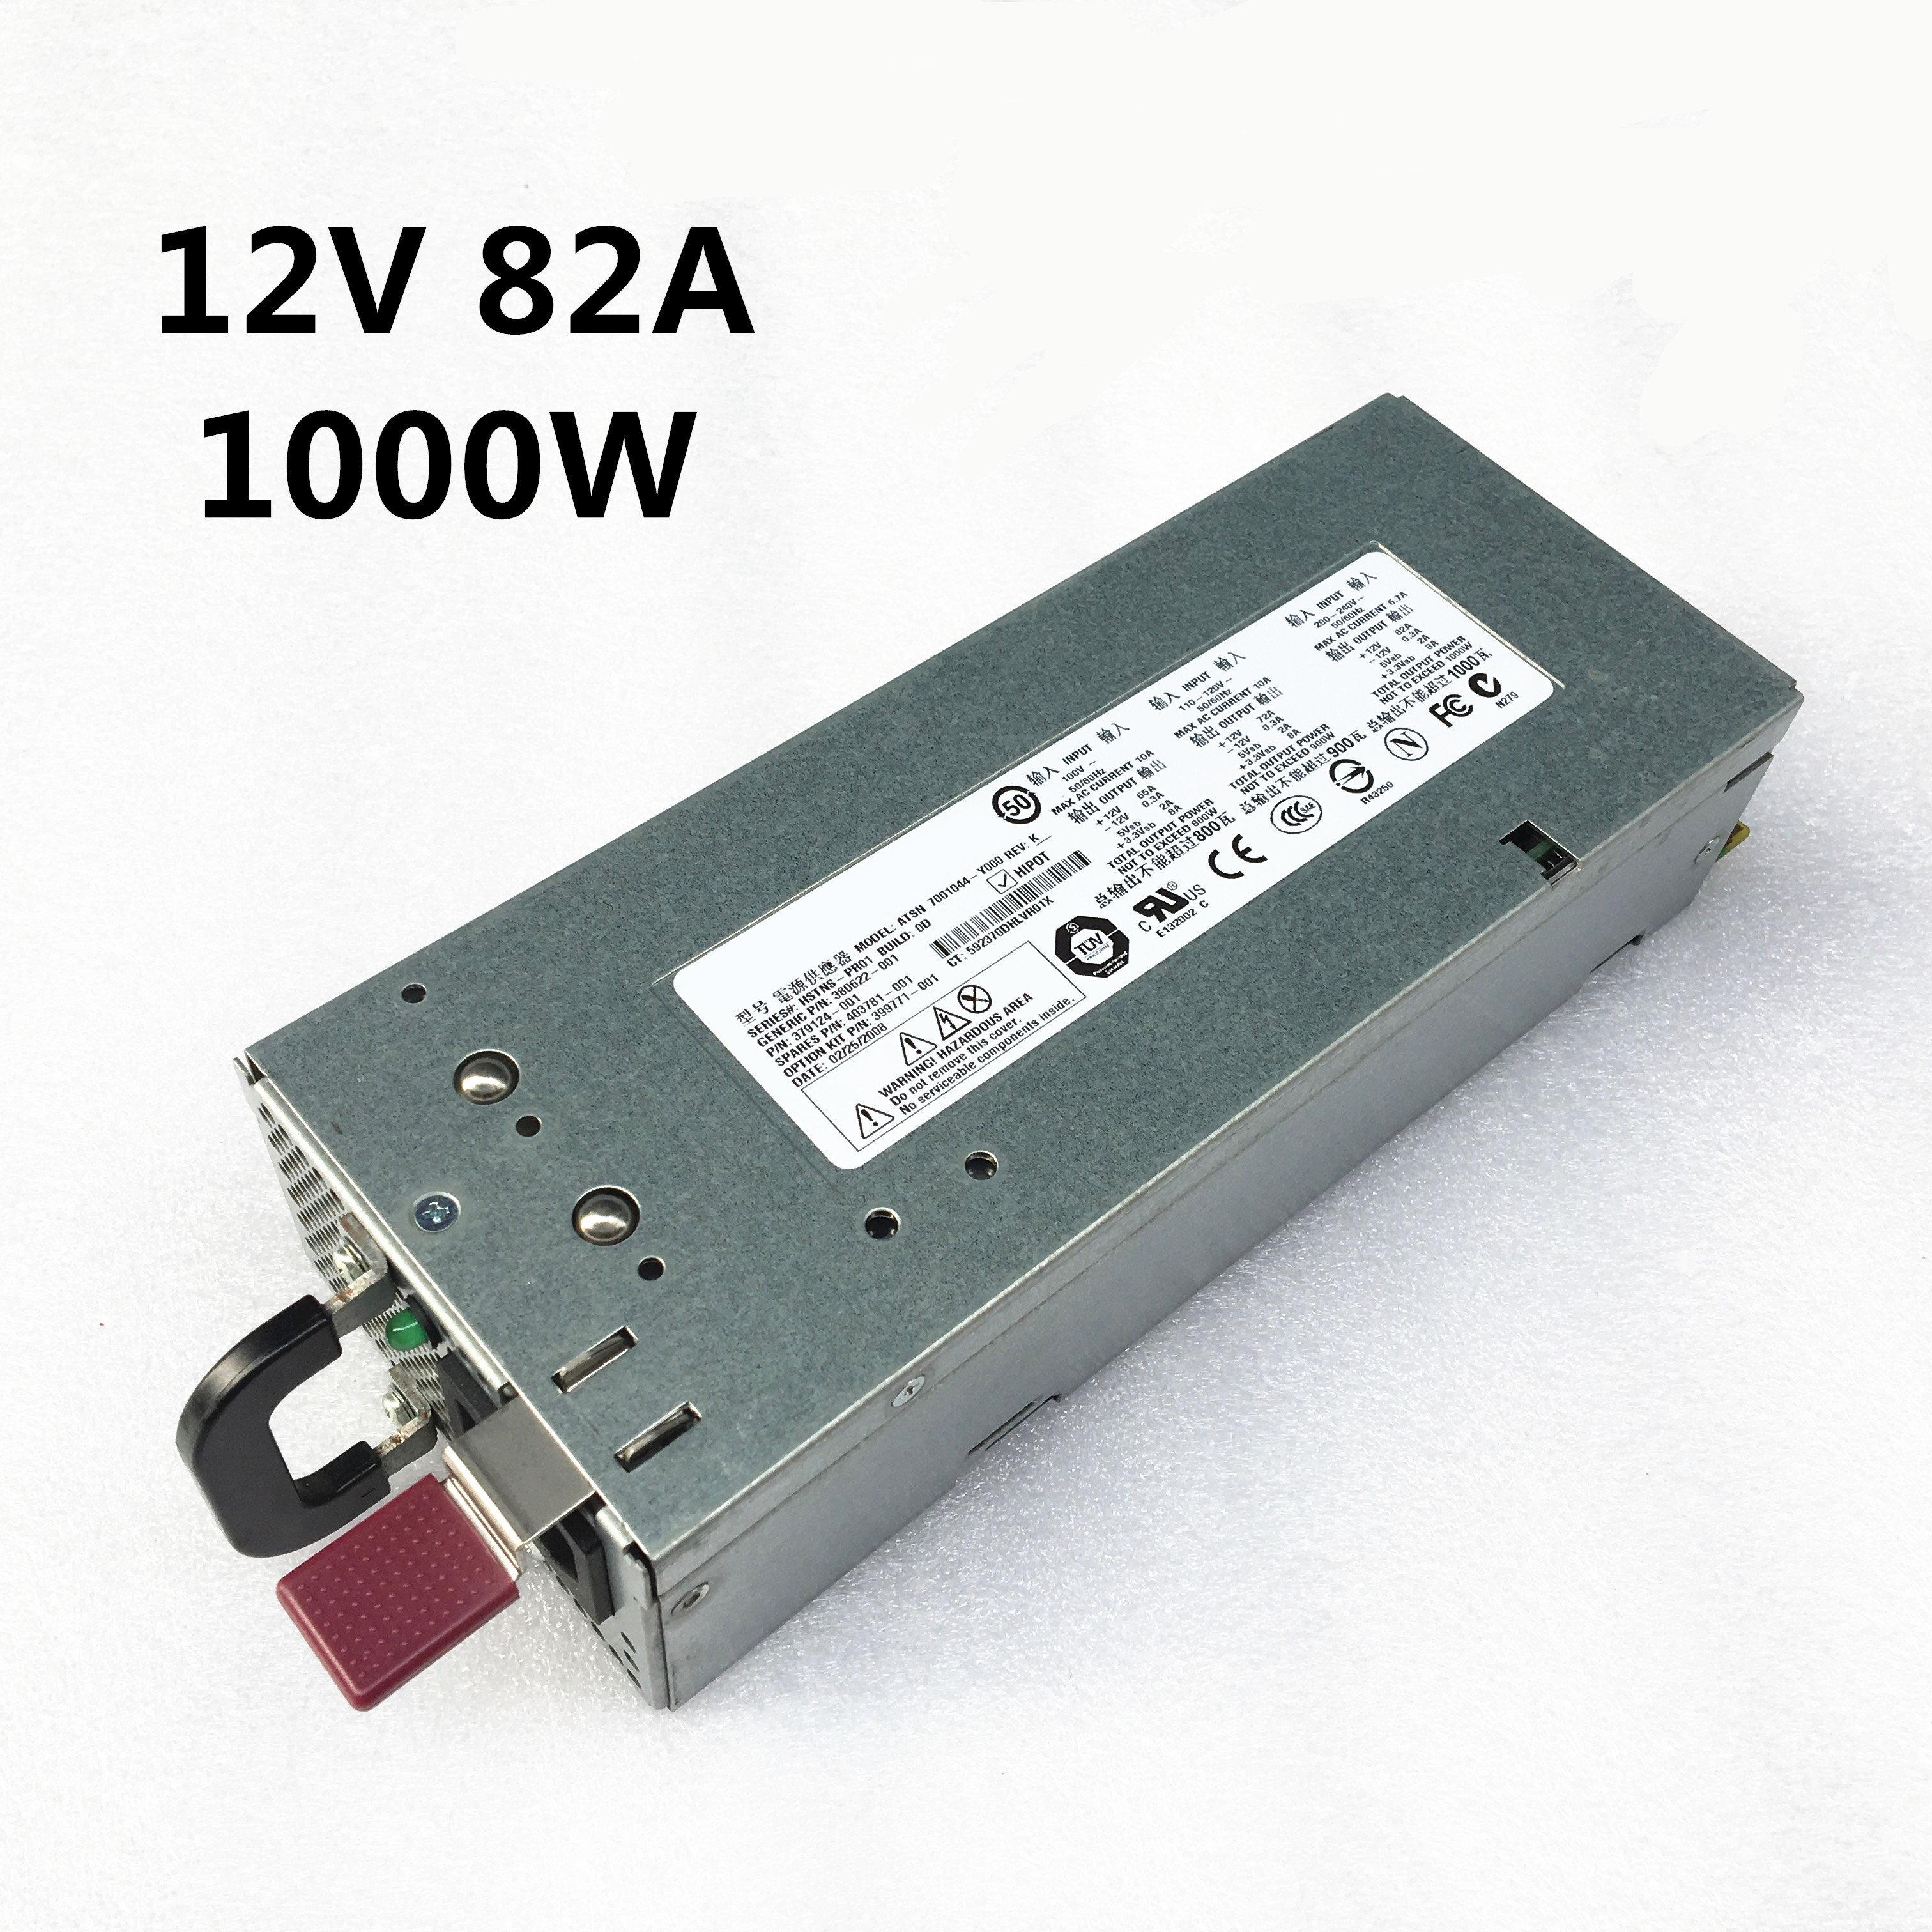 HP Proliant Server Power Supply 1000W 379124-001 380622-001 399771-001 DPS-800GB